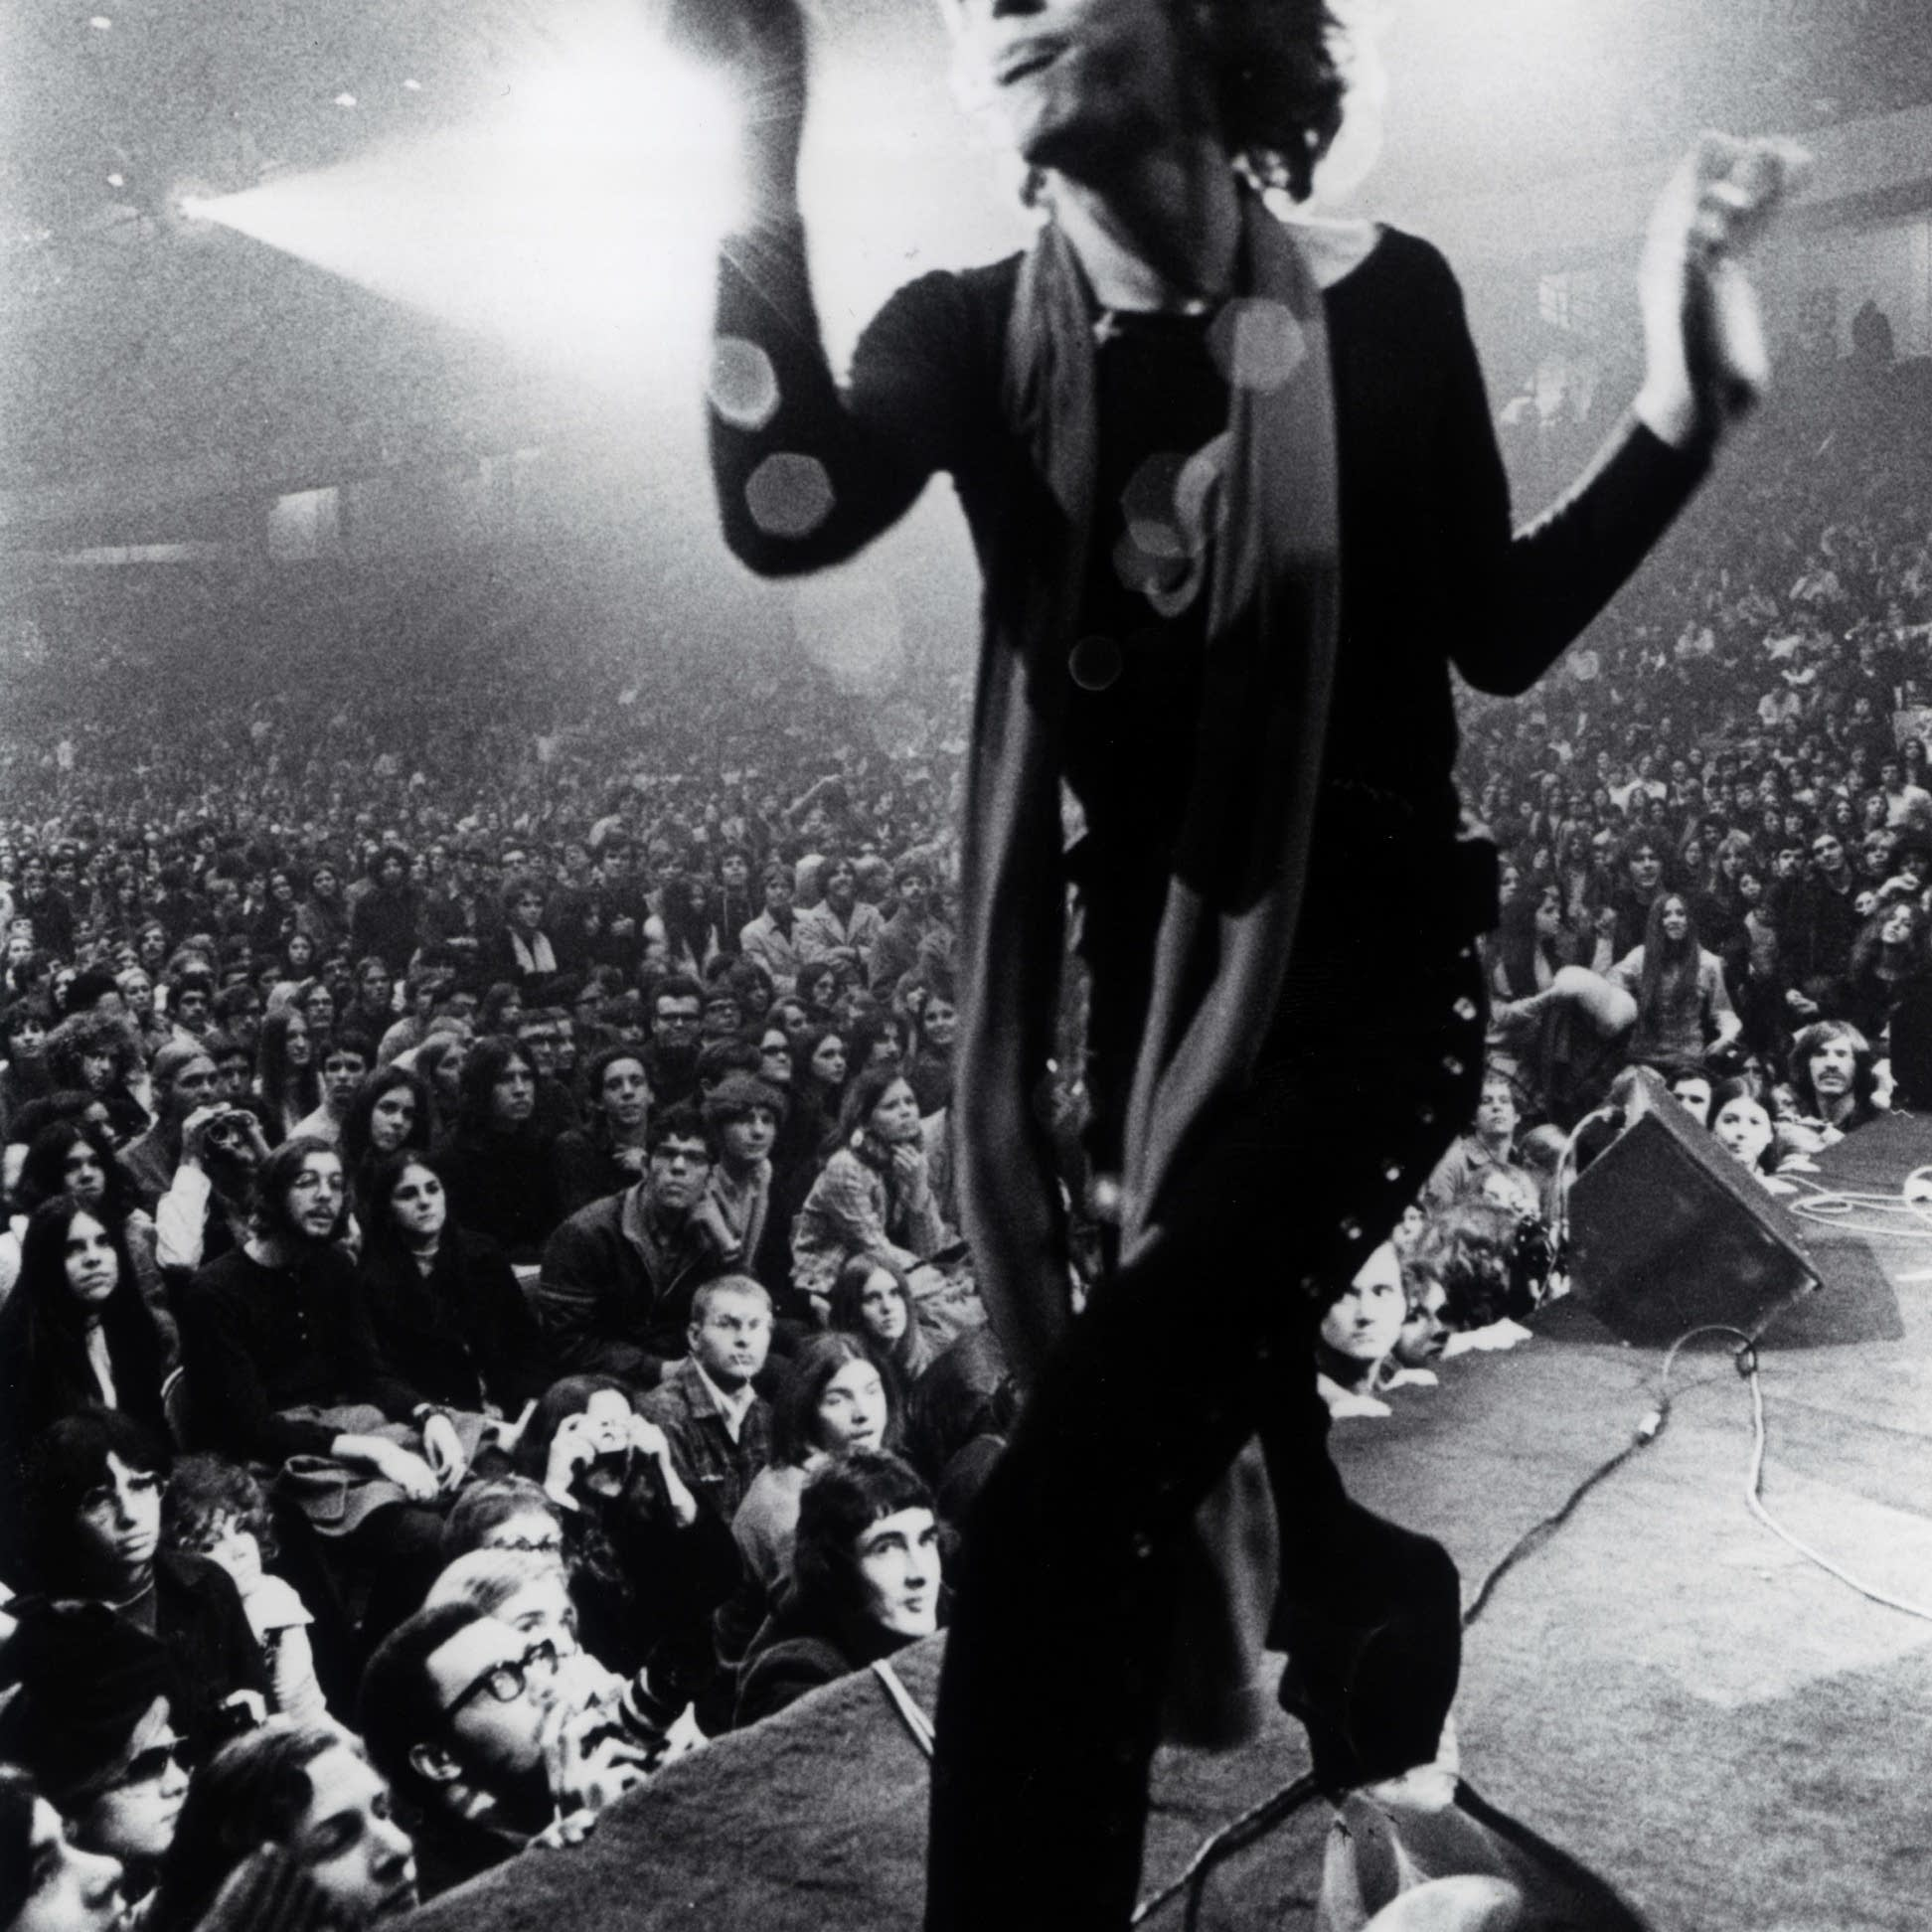 Mick Jagger dancing Gimme Shelter